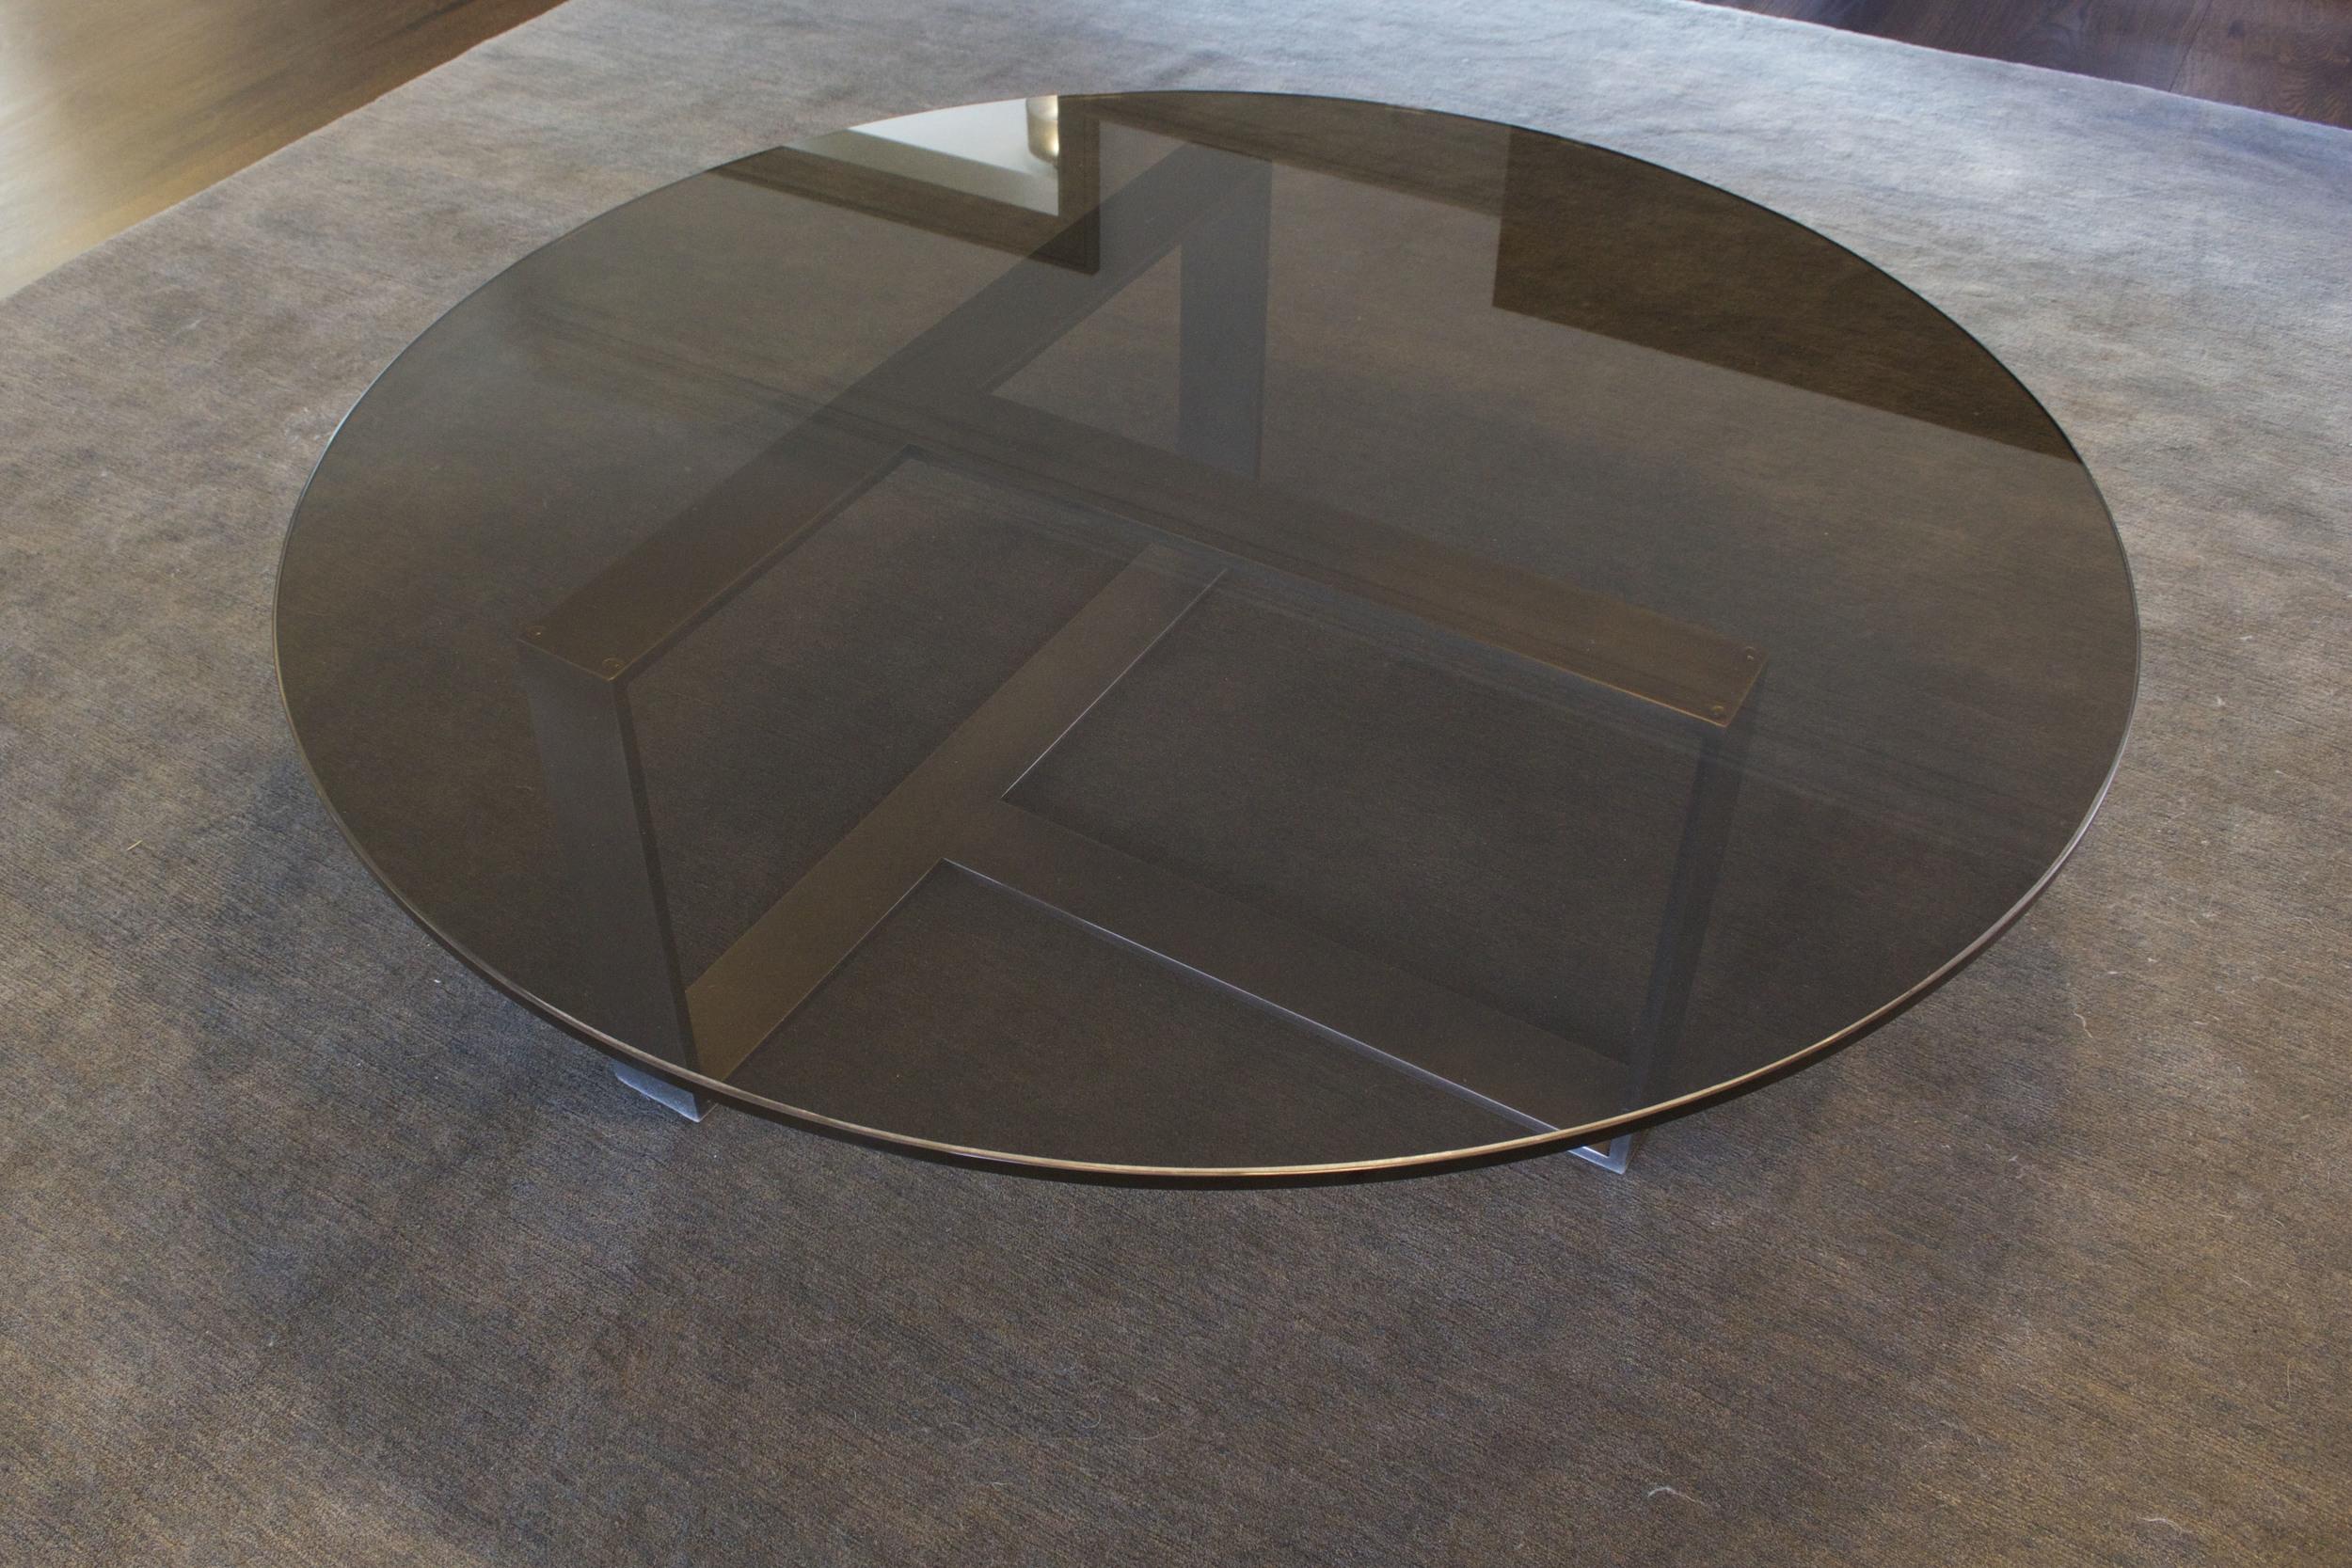 glasscoffeeoverview2.jpg